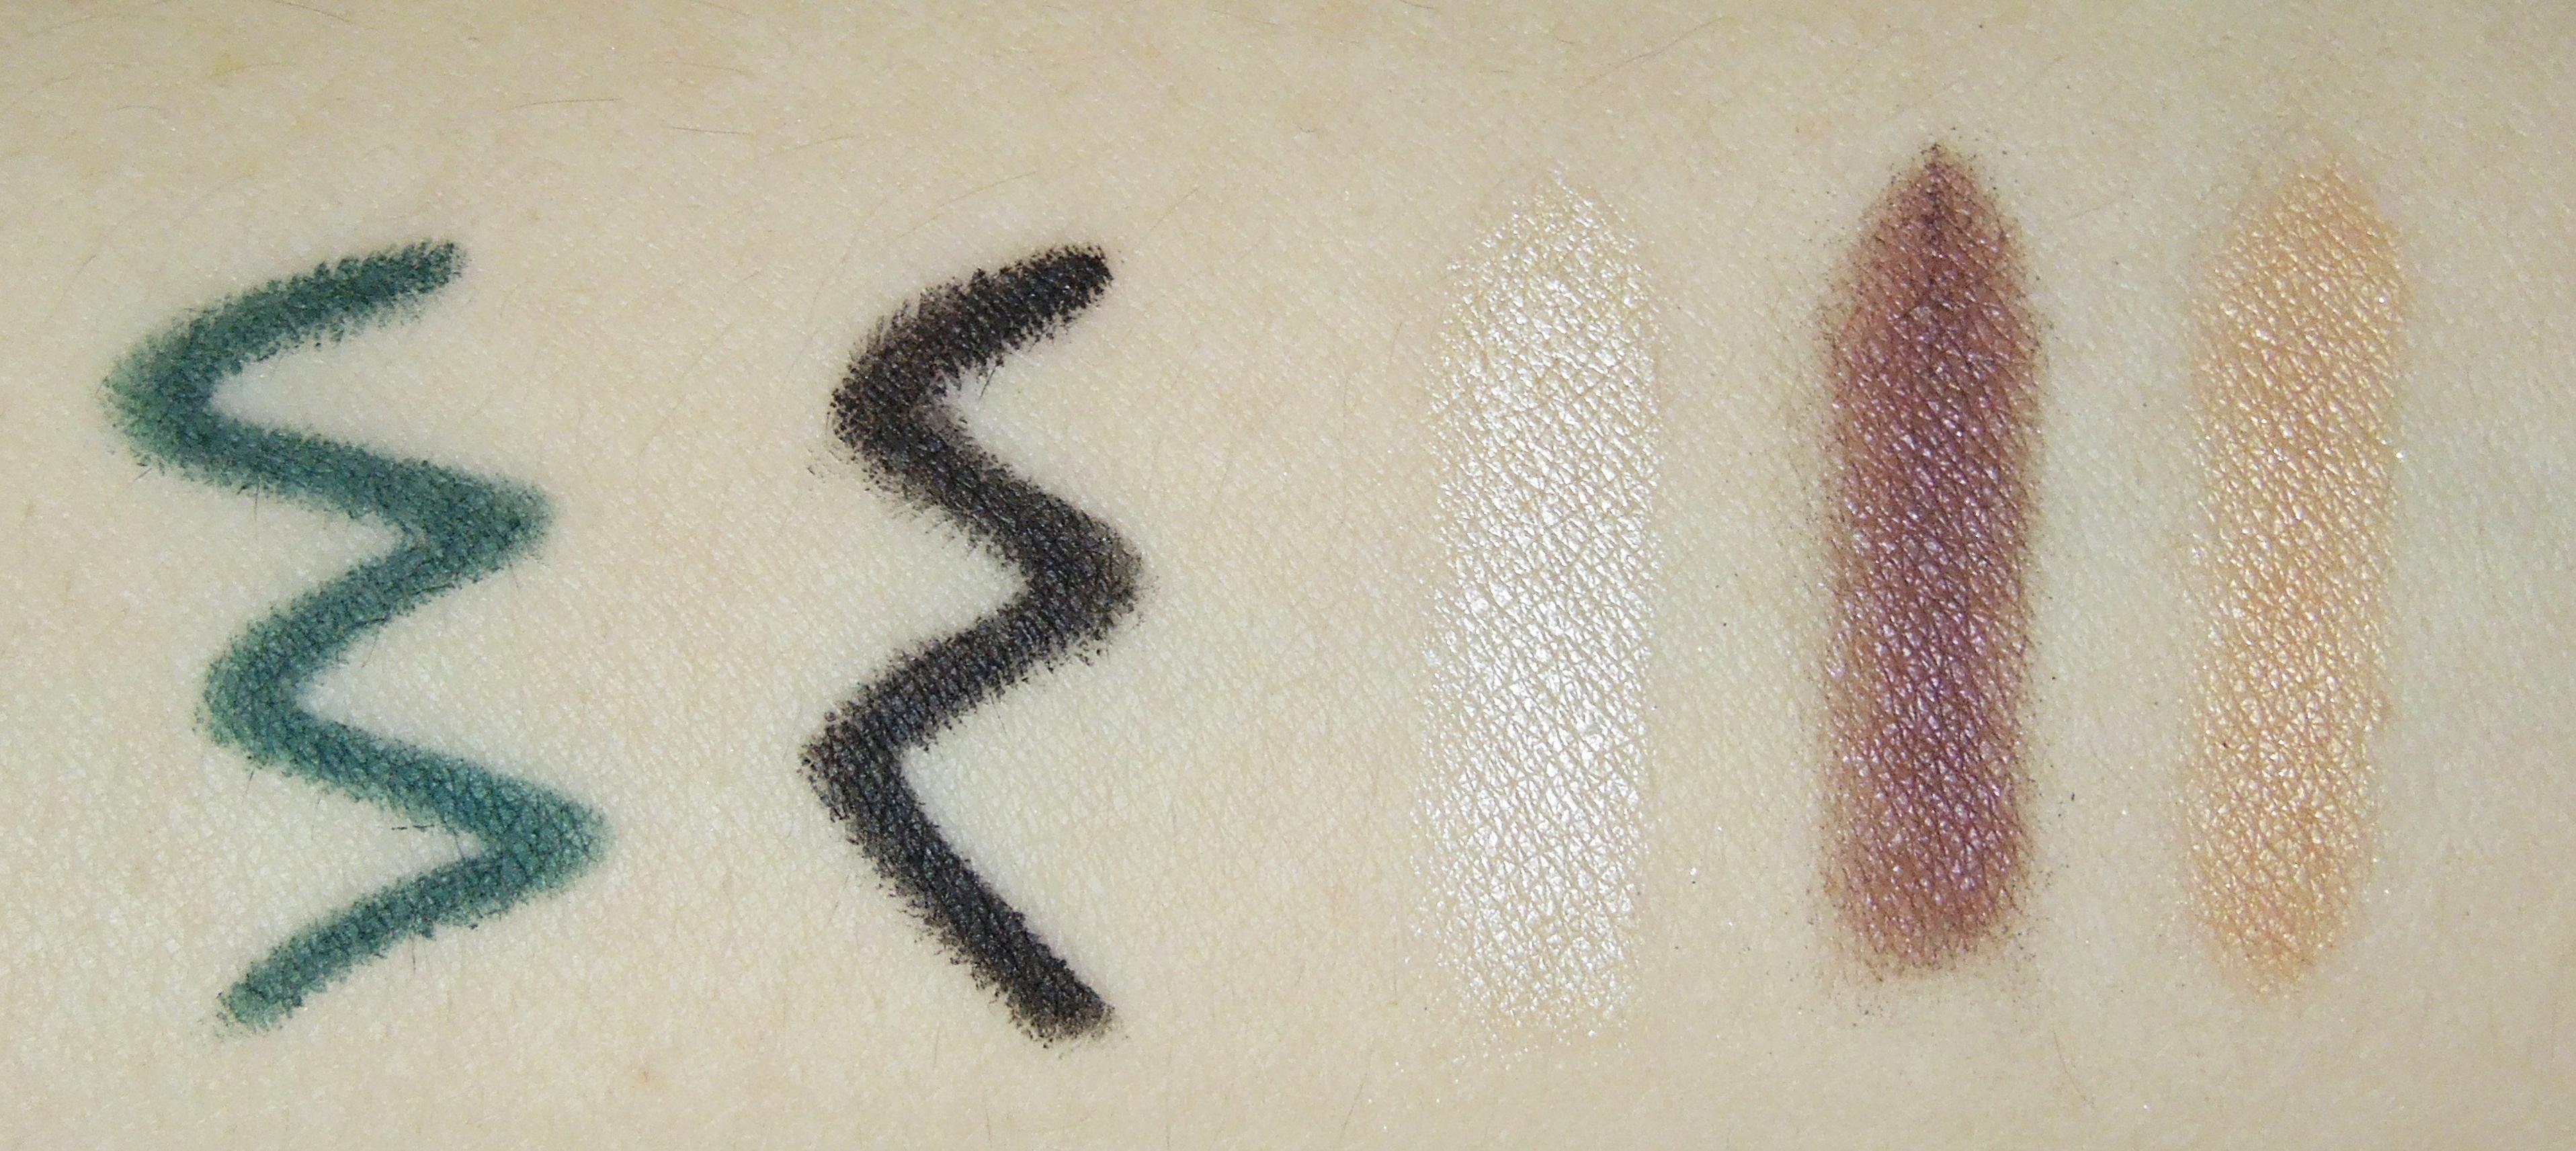 Goddess Pencil by Eye of Horus #5